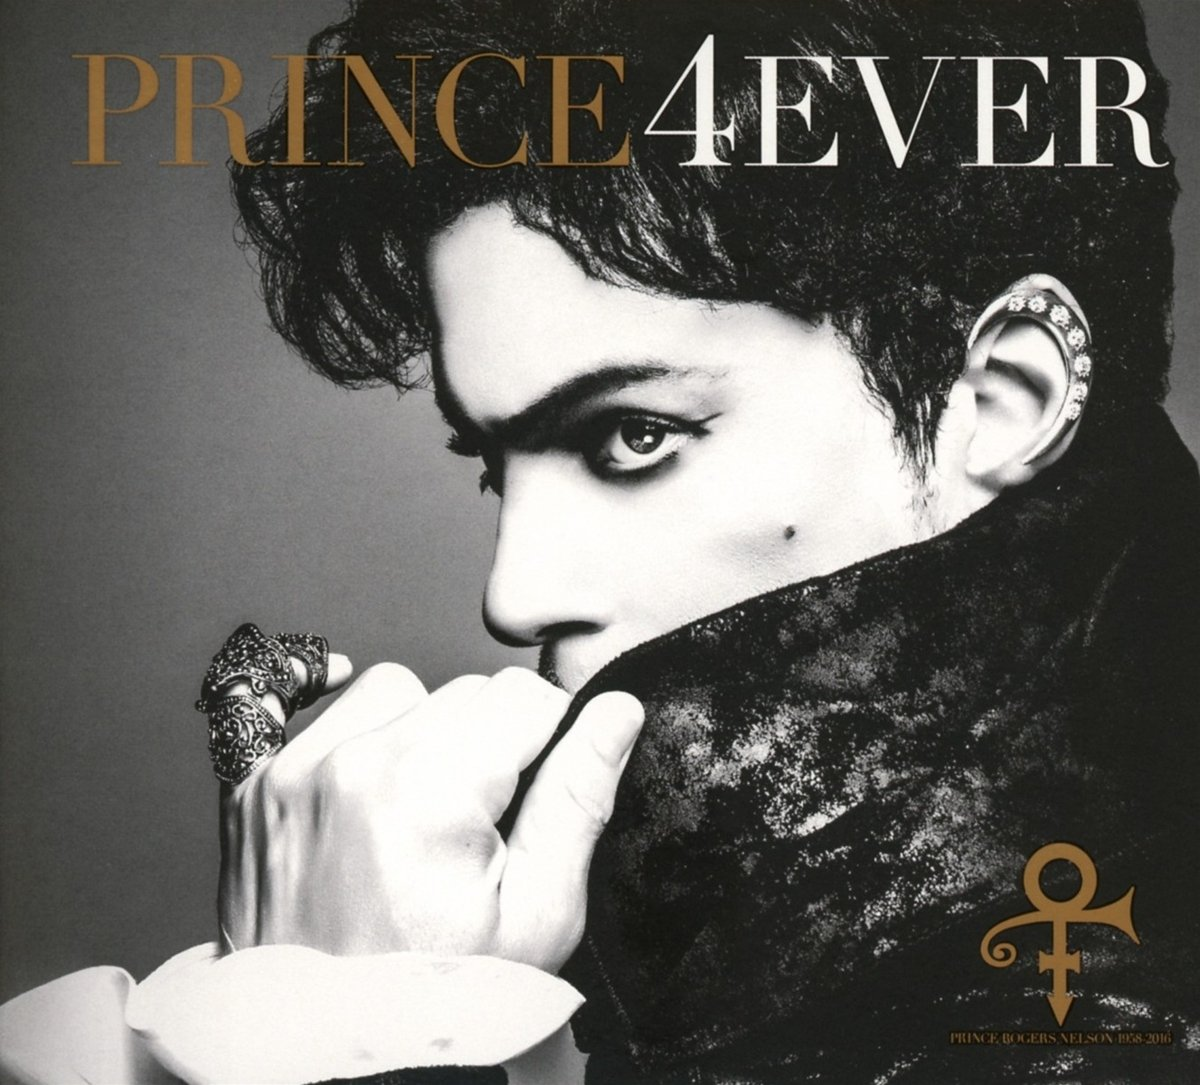 Prince - 4ever [2016]